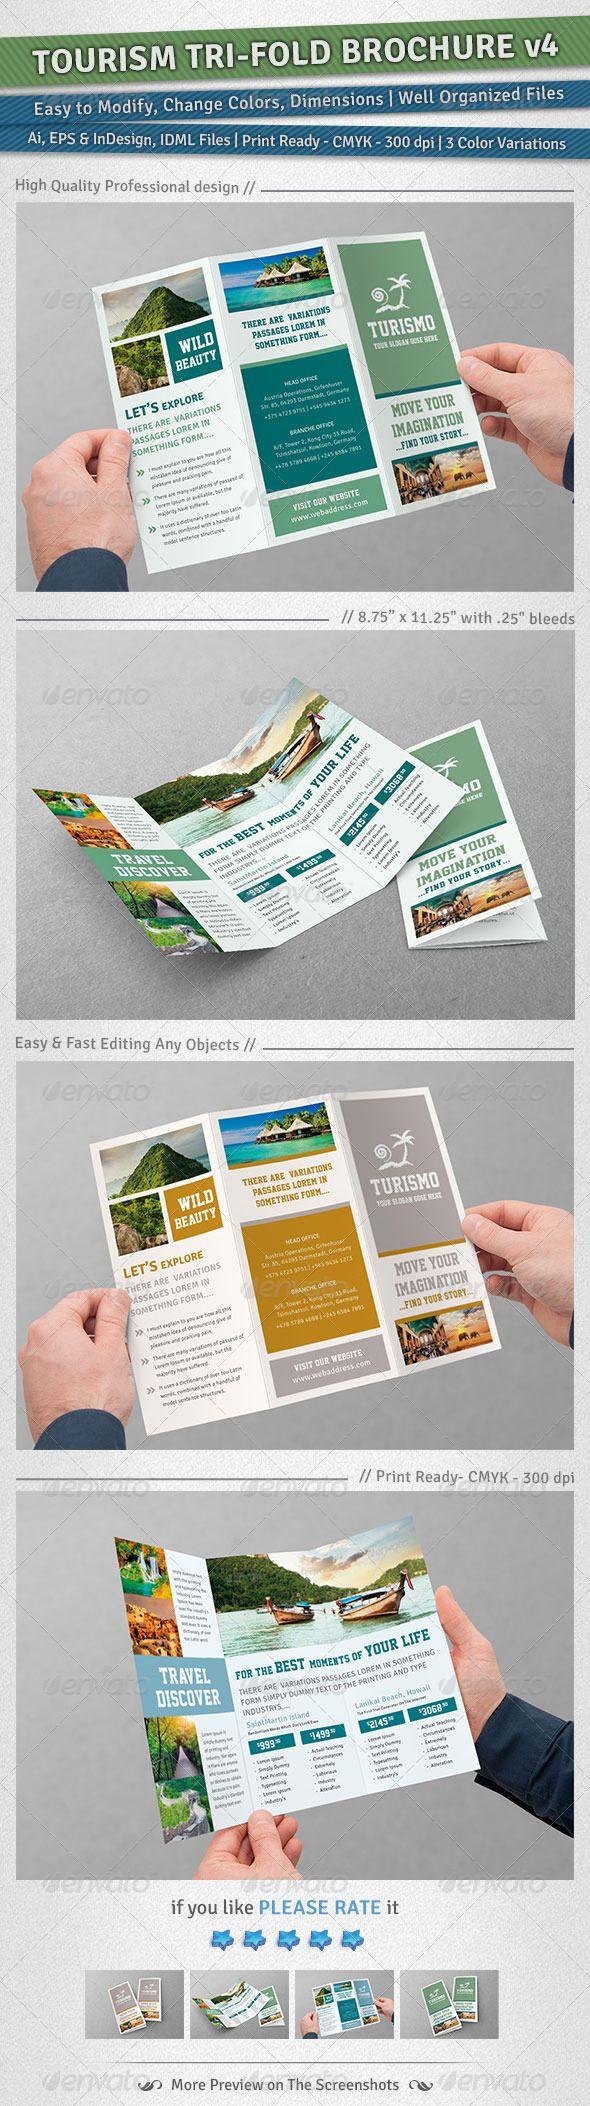 Tourism Tri-Fold Brochure   Volume 4  EPS Template • Download ➝ https://graphicriver.net/item/tourism-trifold-brochure-volume-4/6048011?ref=pxcr